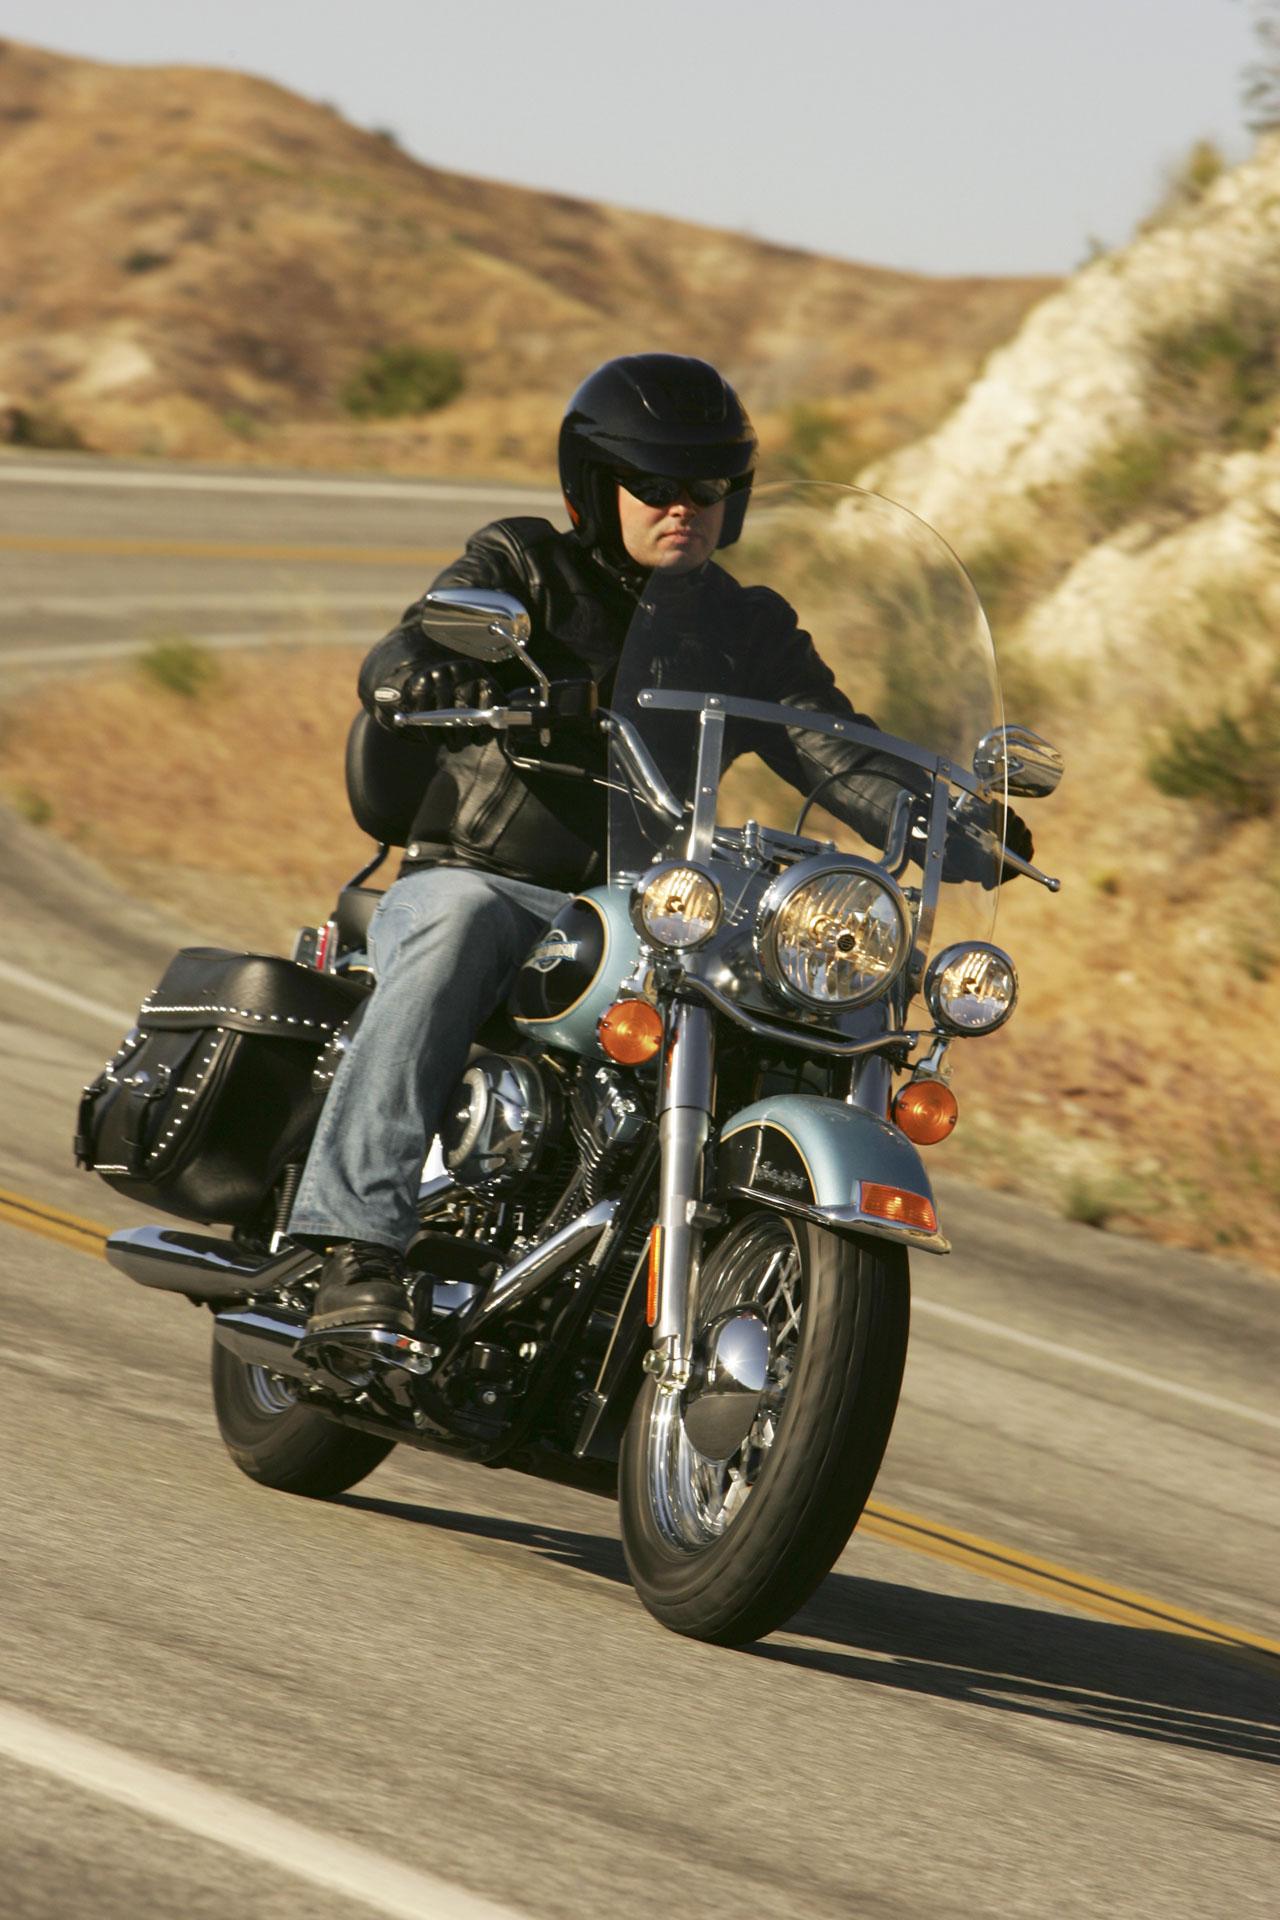 Harley Davidson Heritage Softail Classic Specs - 2006  2007